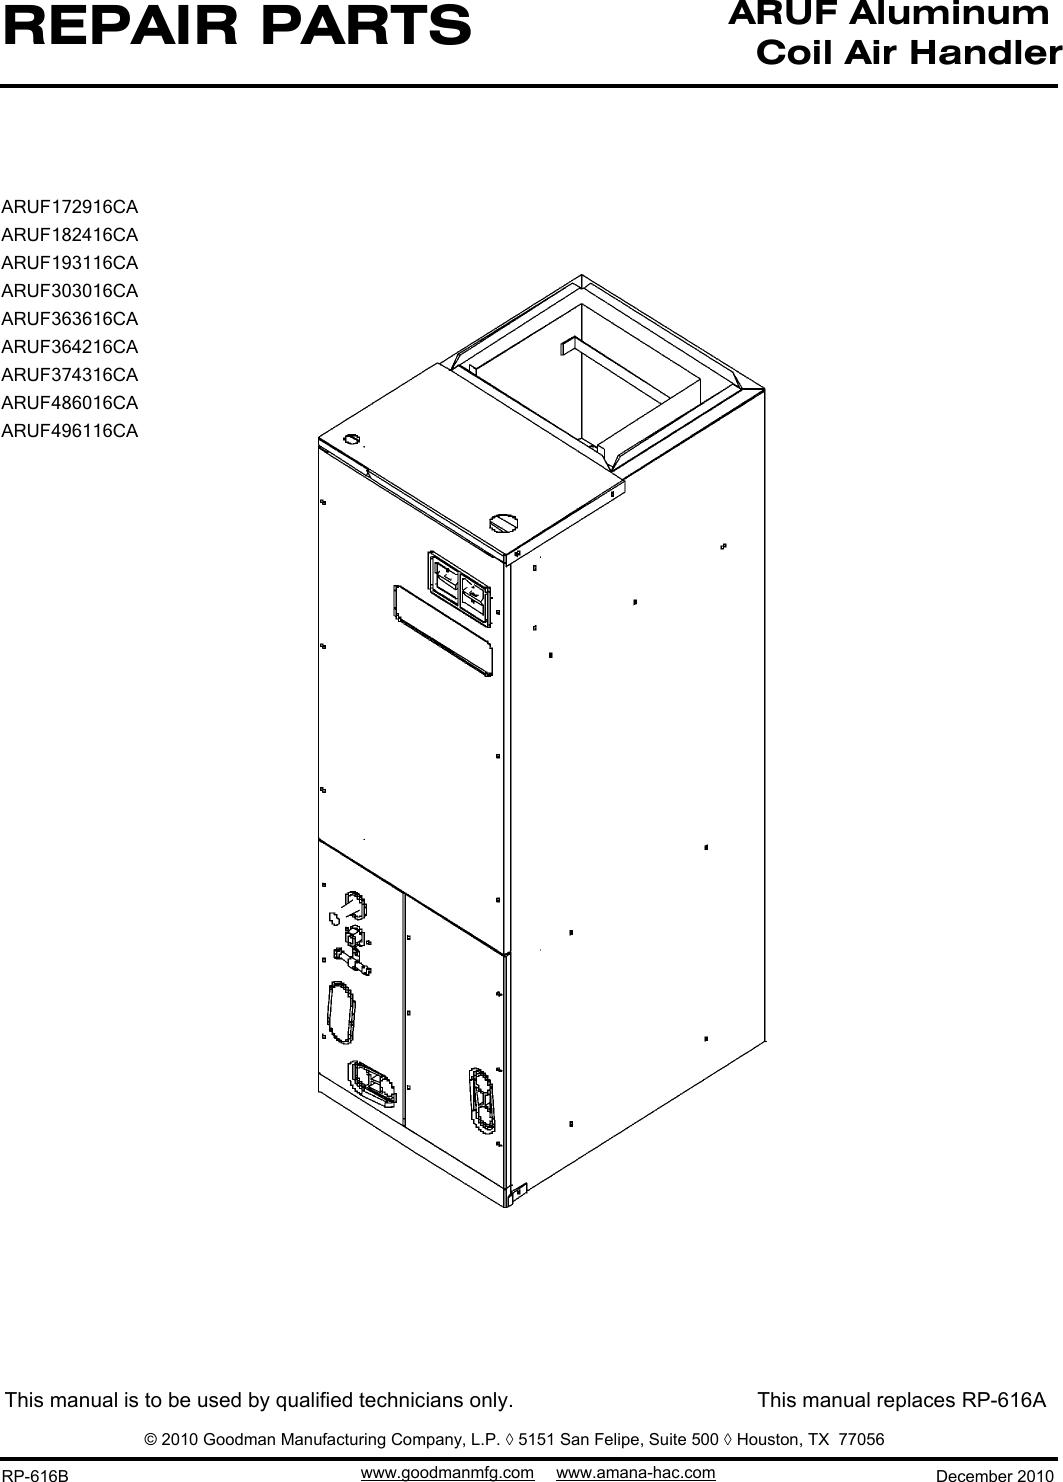 Pcbfm131 Time Delay Relay Wiring Diagram